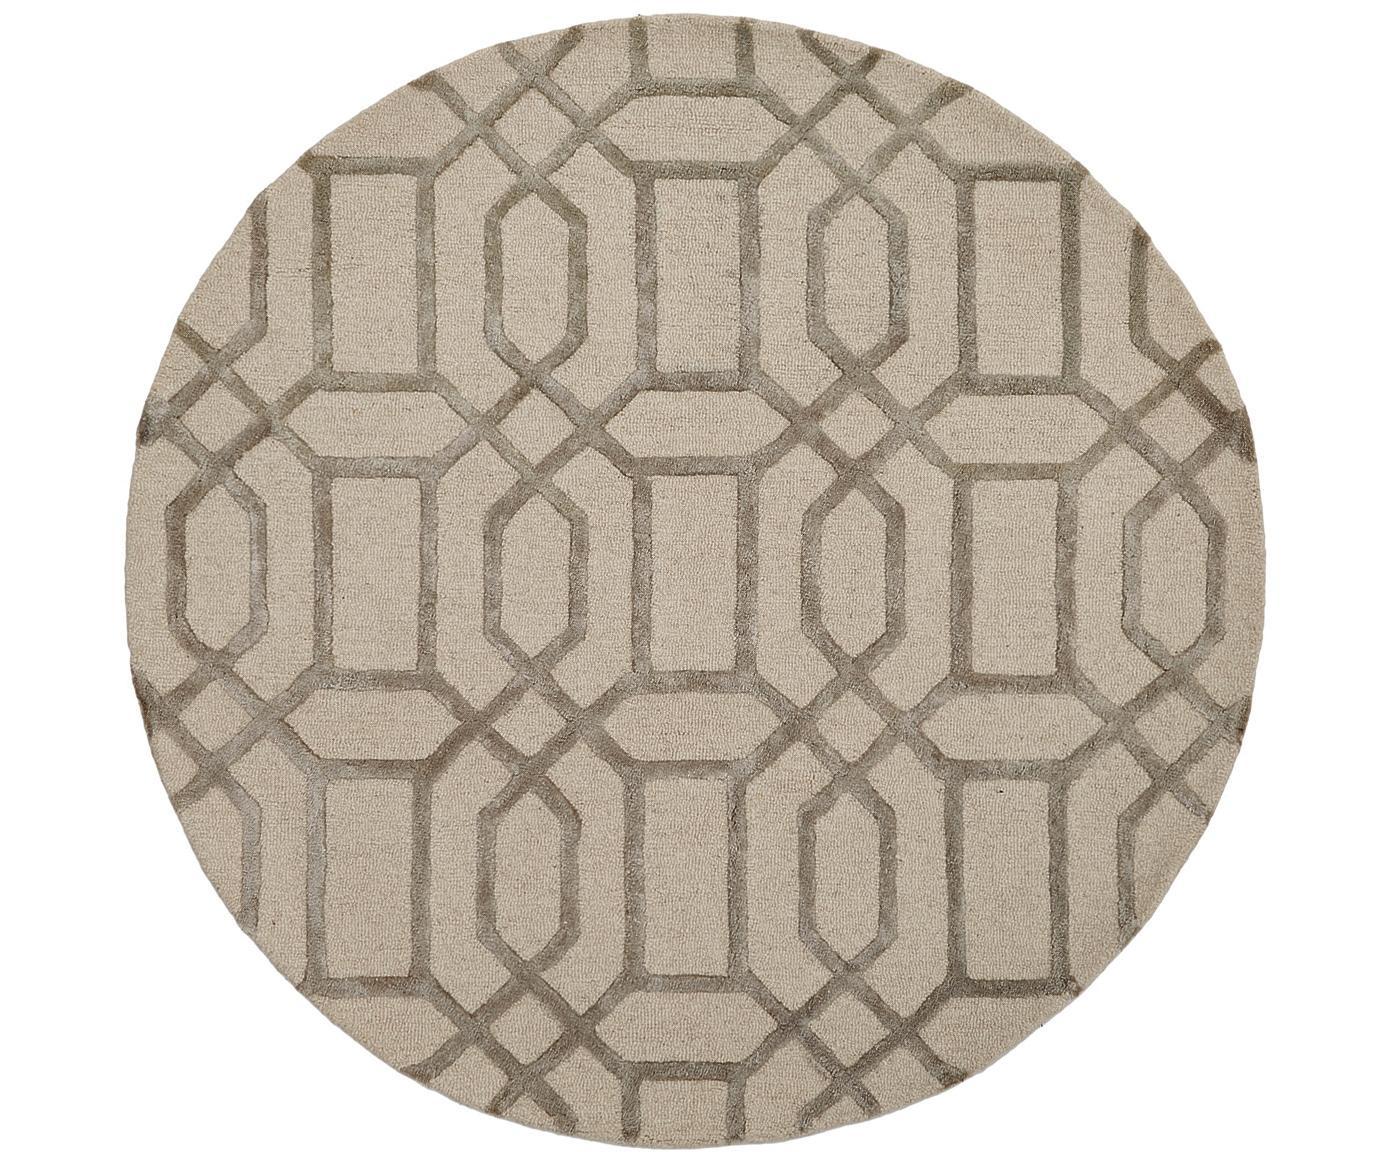 Alfombra redonda de lana Vegas, Parte superior: 80%lana, 20%viscosa, Reverso: algodón, Beige, crema, Ø 150 cm (Tamaño M)